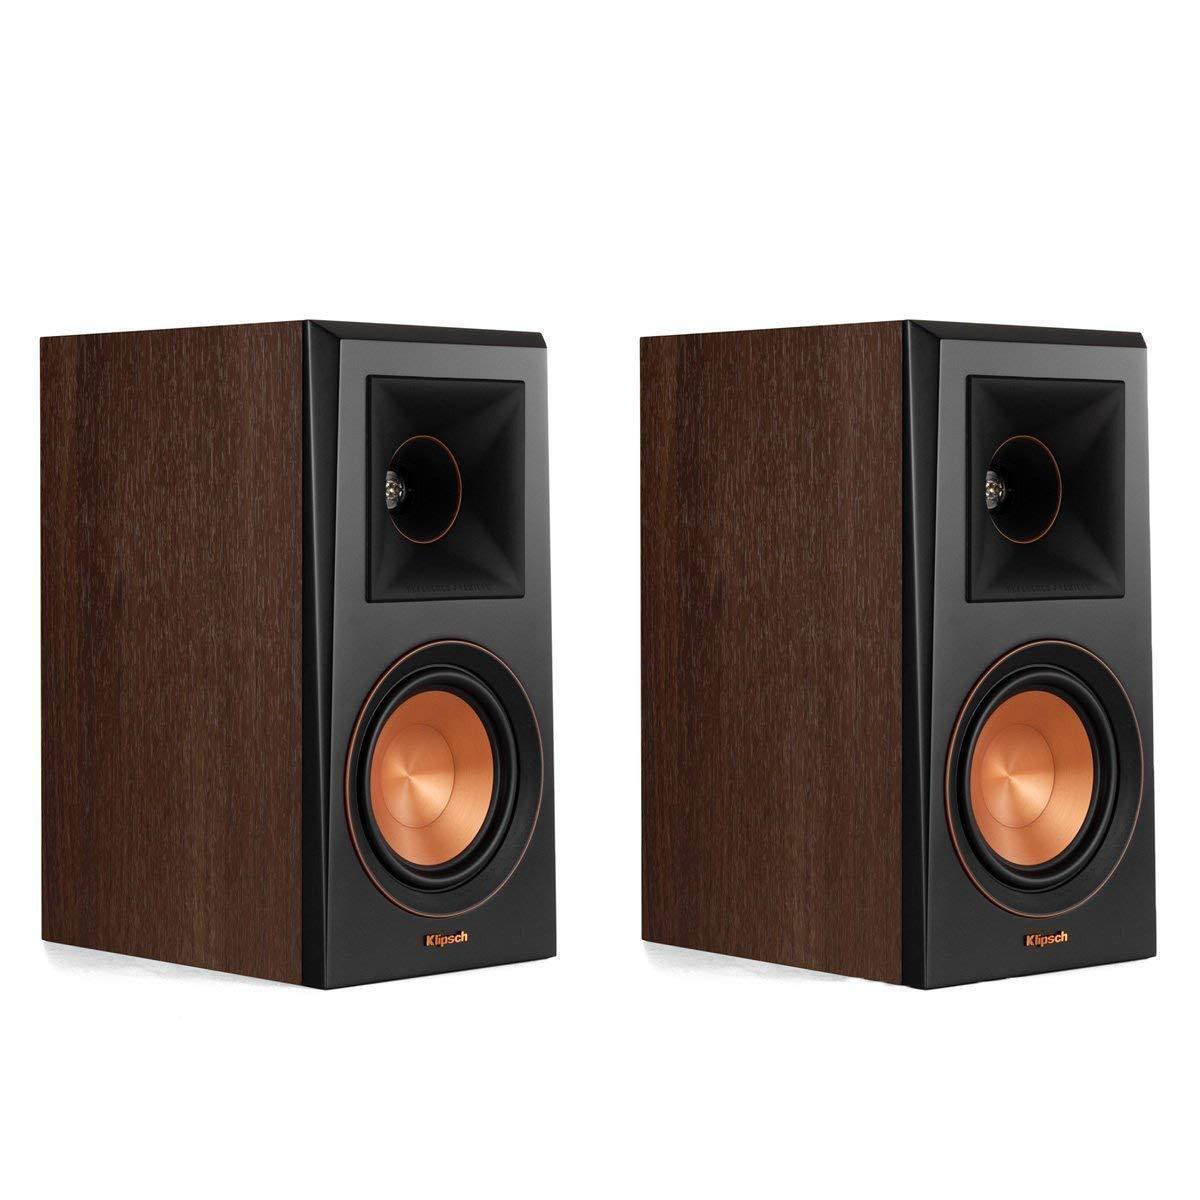 Klipsch RP-500M Bookshelf Speaker -Walnut (Pair)